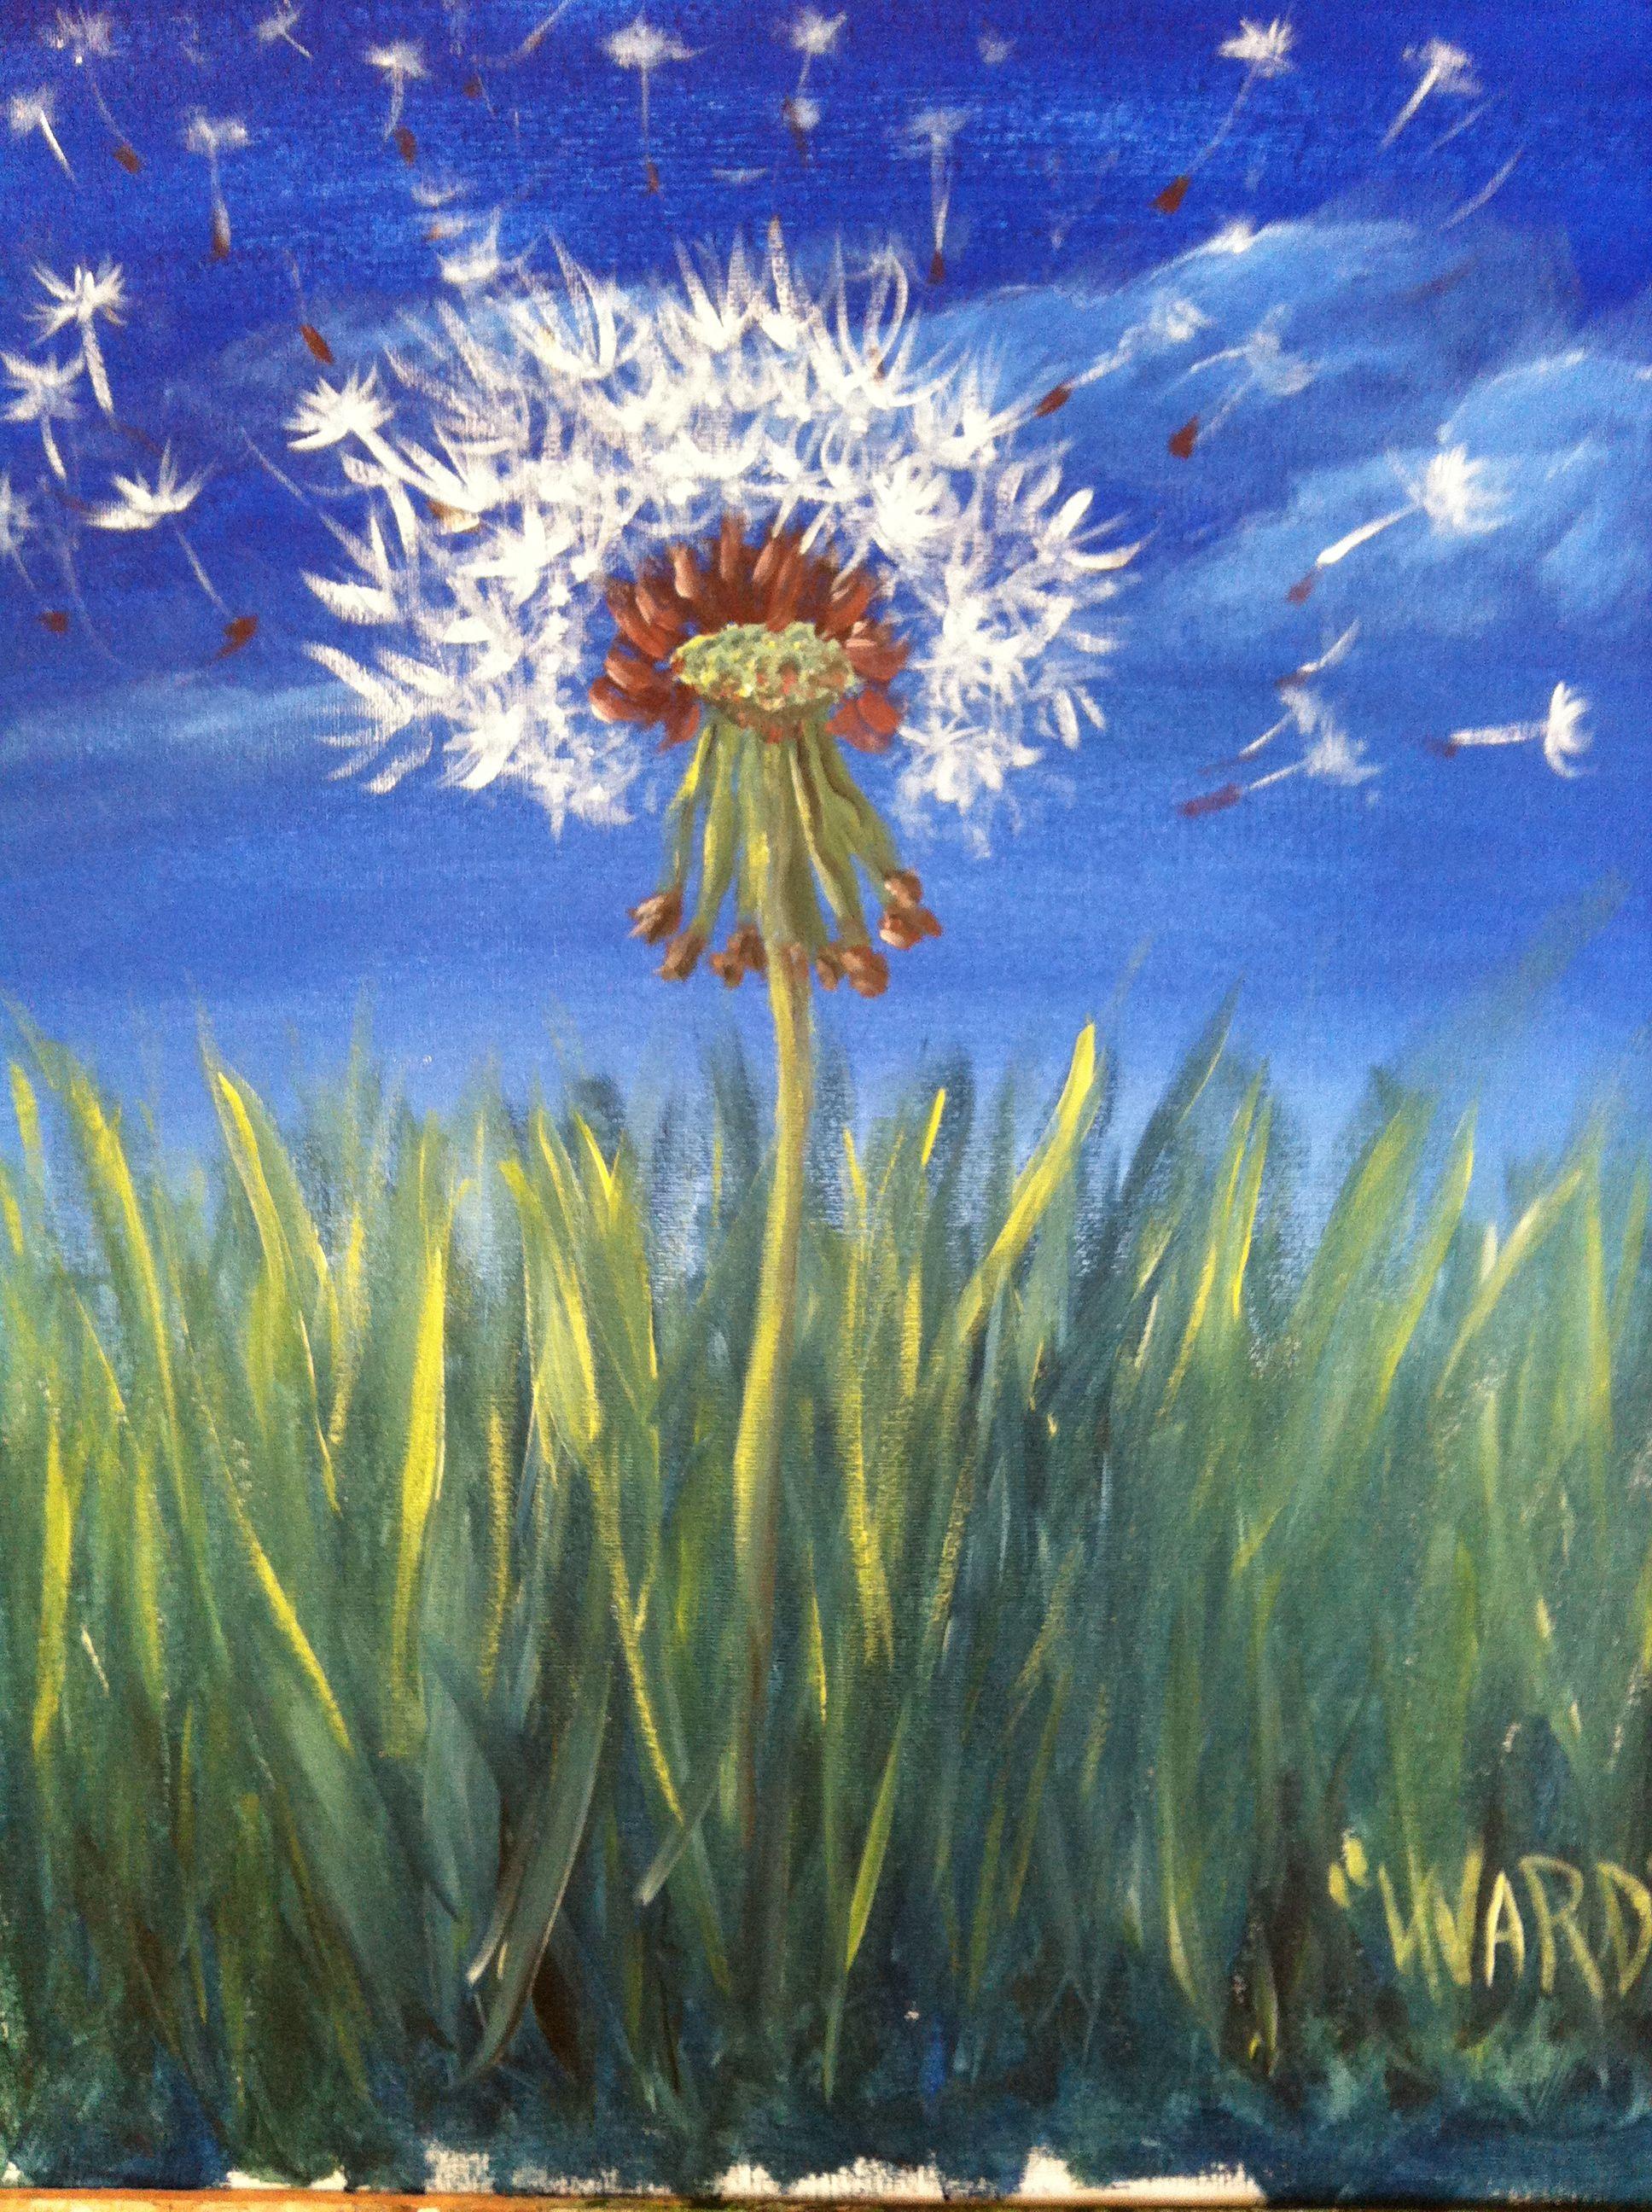 watercolor image by Karen Hall Painting, Paint nite